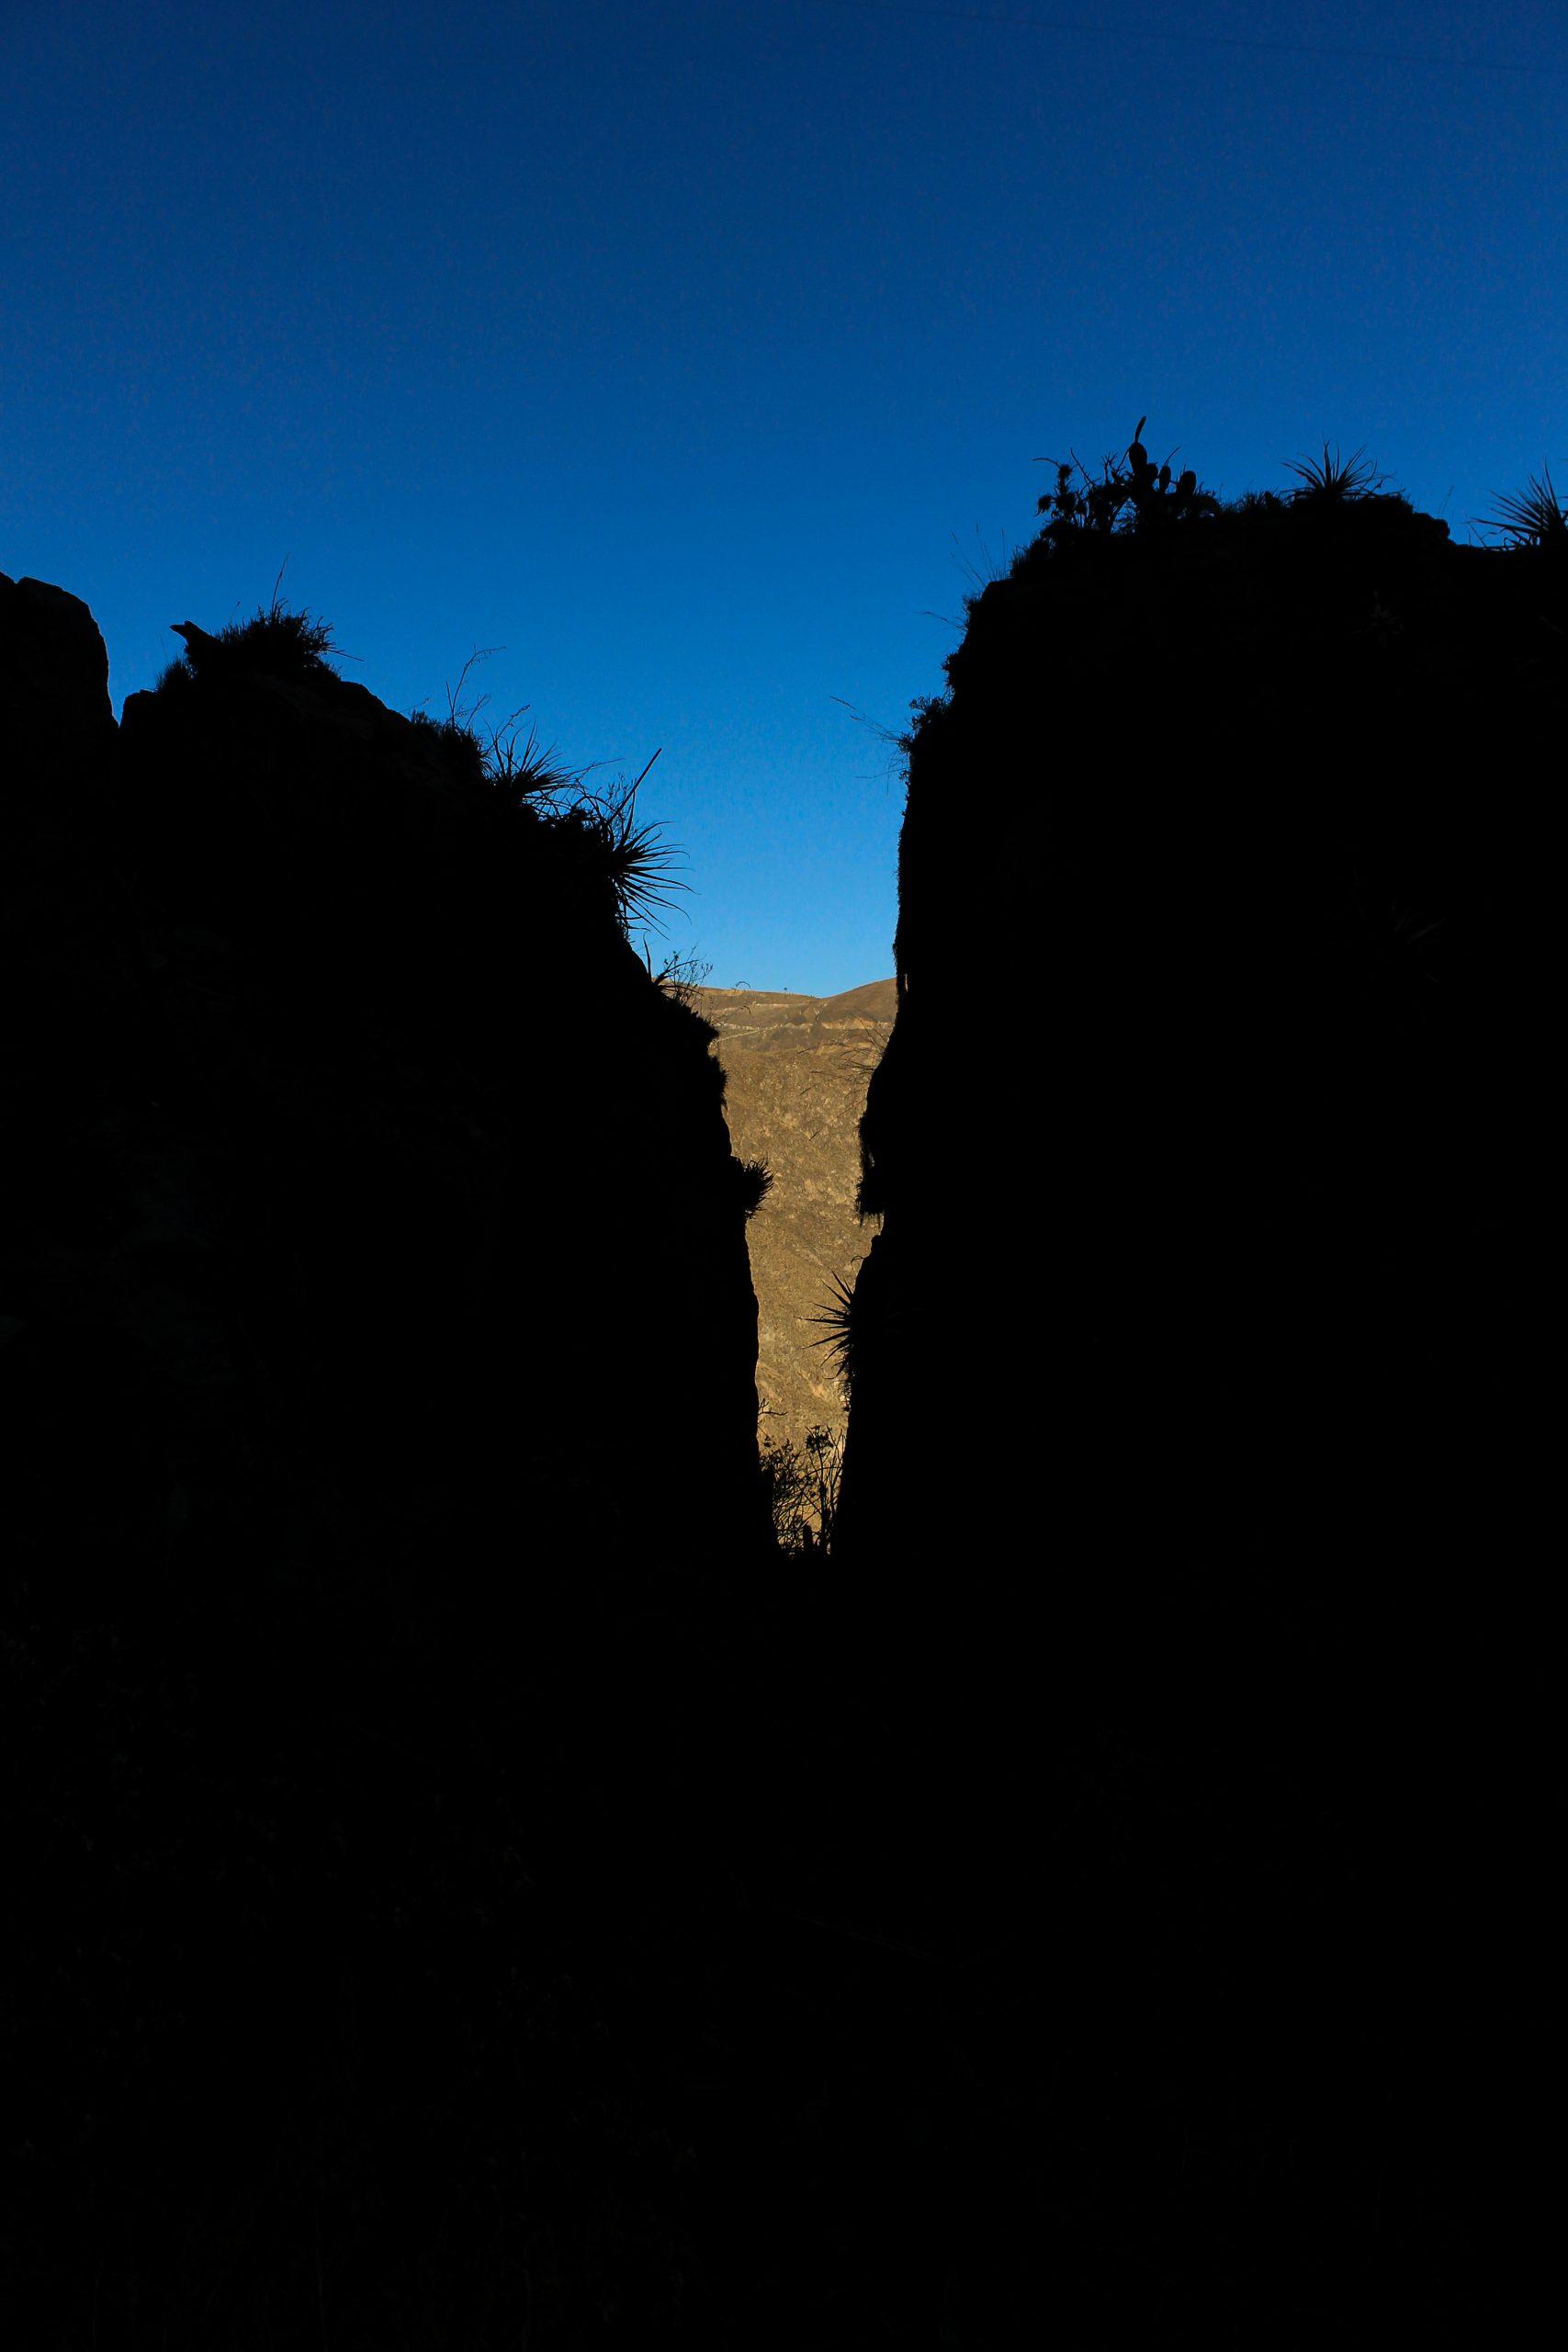 Colca Canyon, Peru, South America